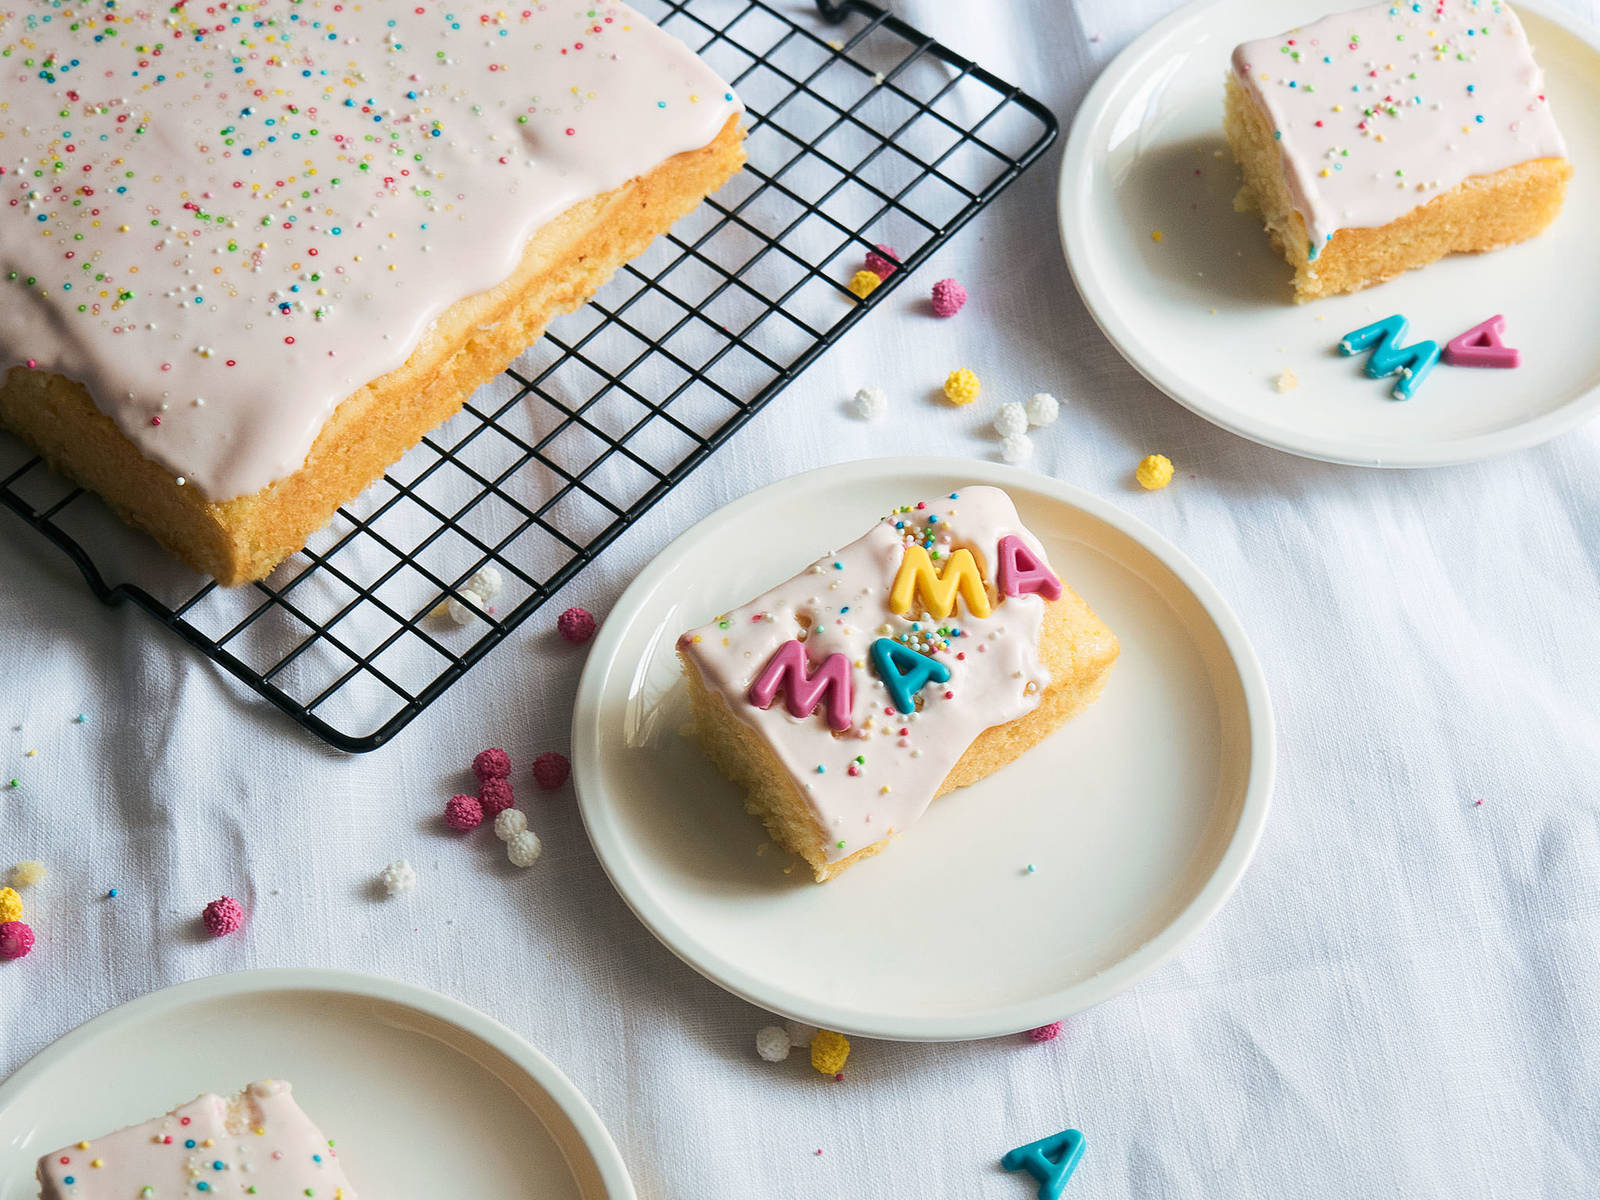 Tangy lemon sheet cake